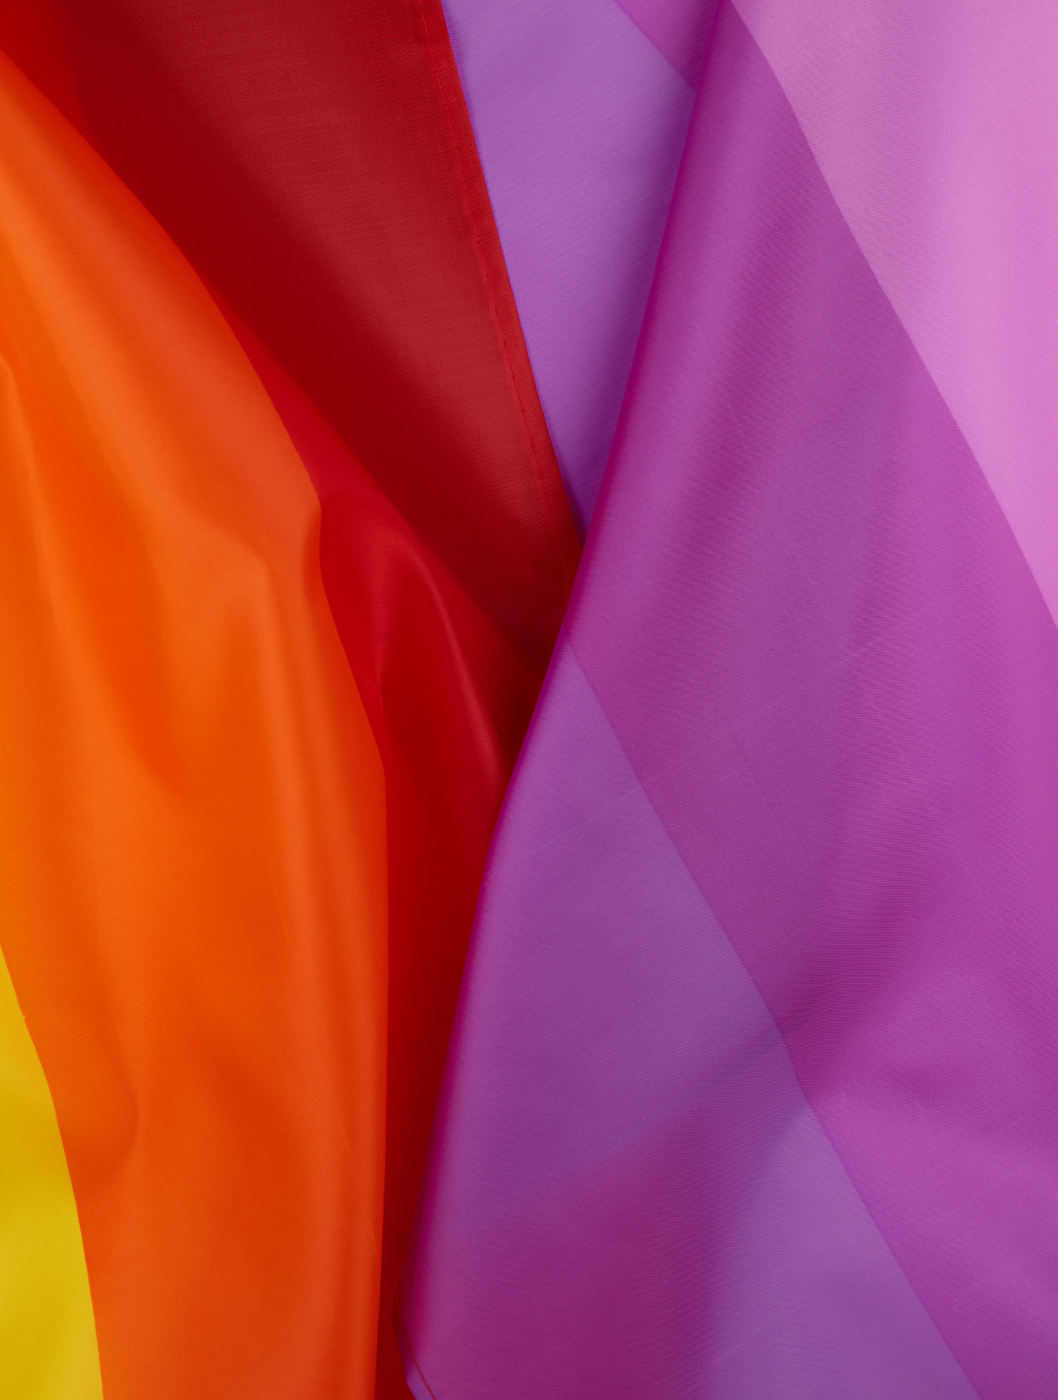 WorldPride 2021: Program